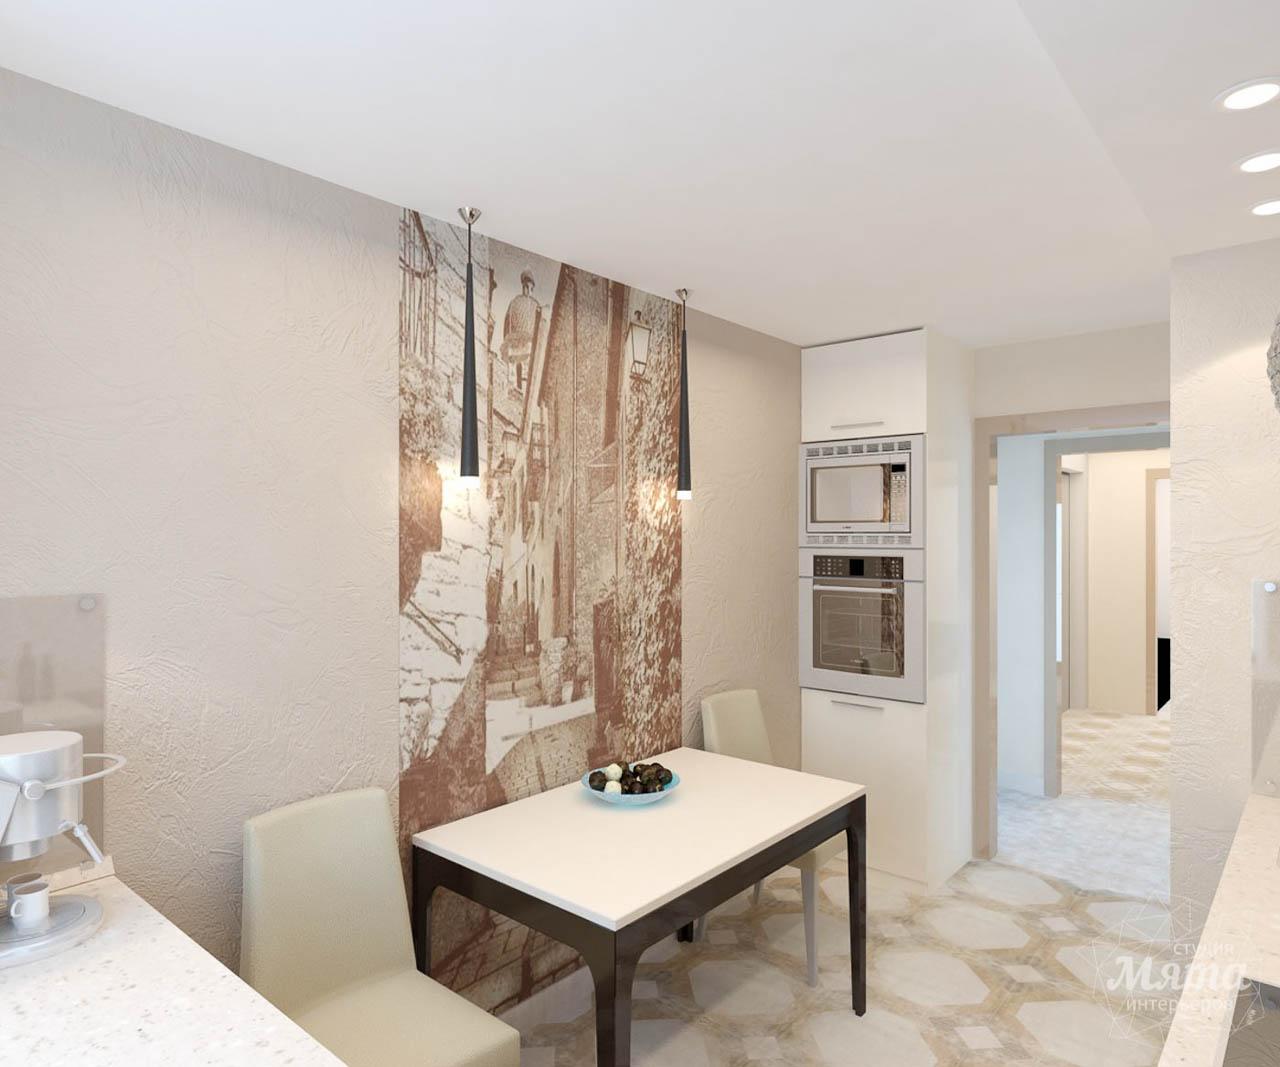 Дизайн интерьера и ремонт однокомнатной квартиры по ул. Бажова 134 img1606652237